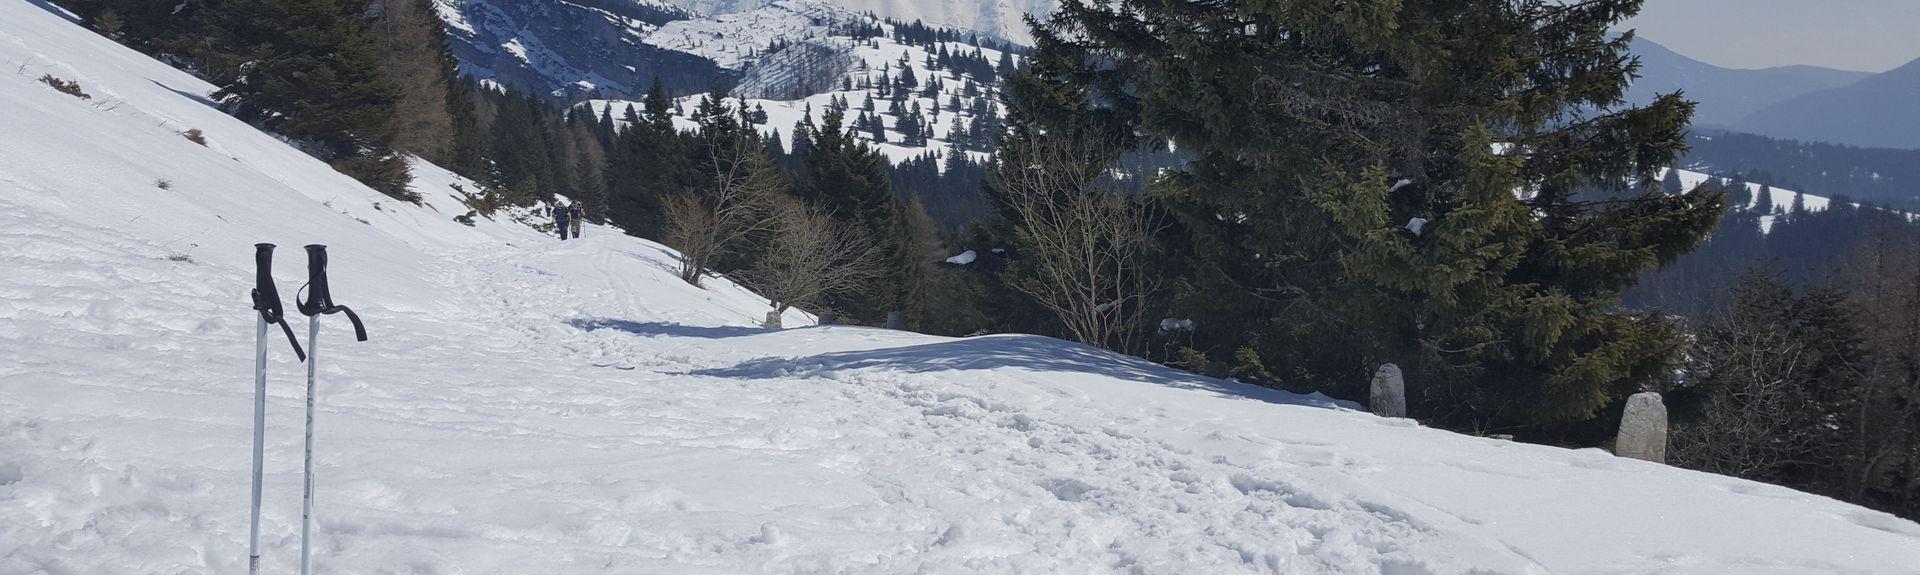 Skigebied Cavalese, Cavalese, Trentino-Zuid-Tirol, Italië